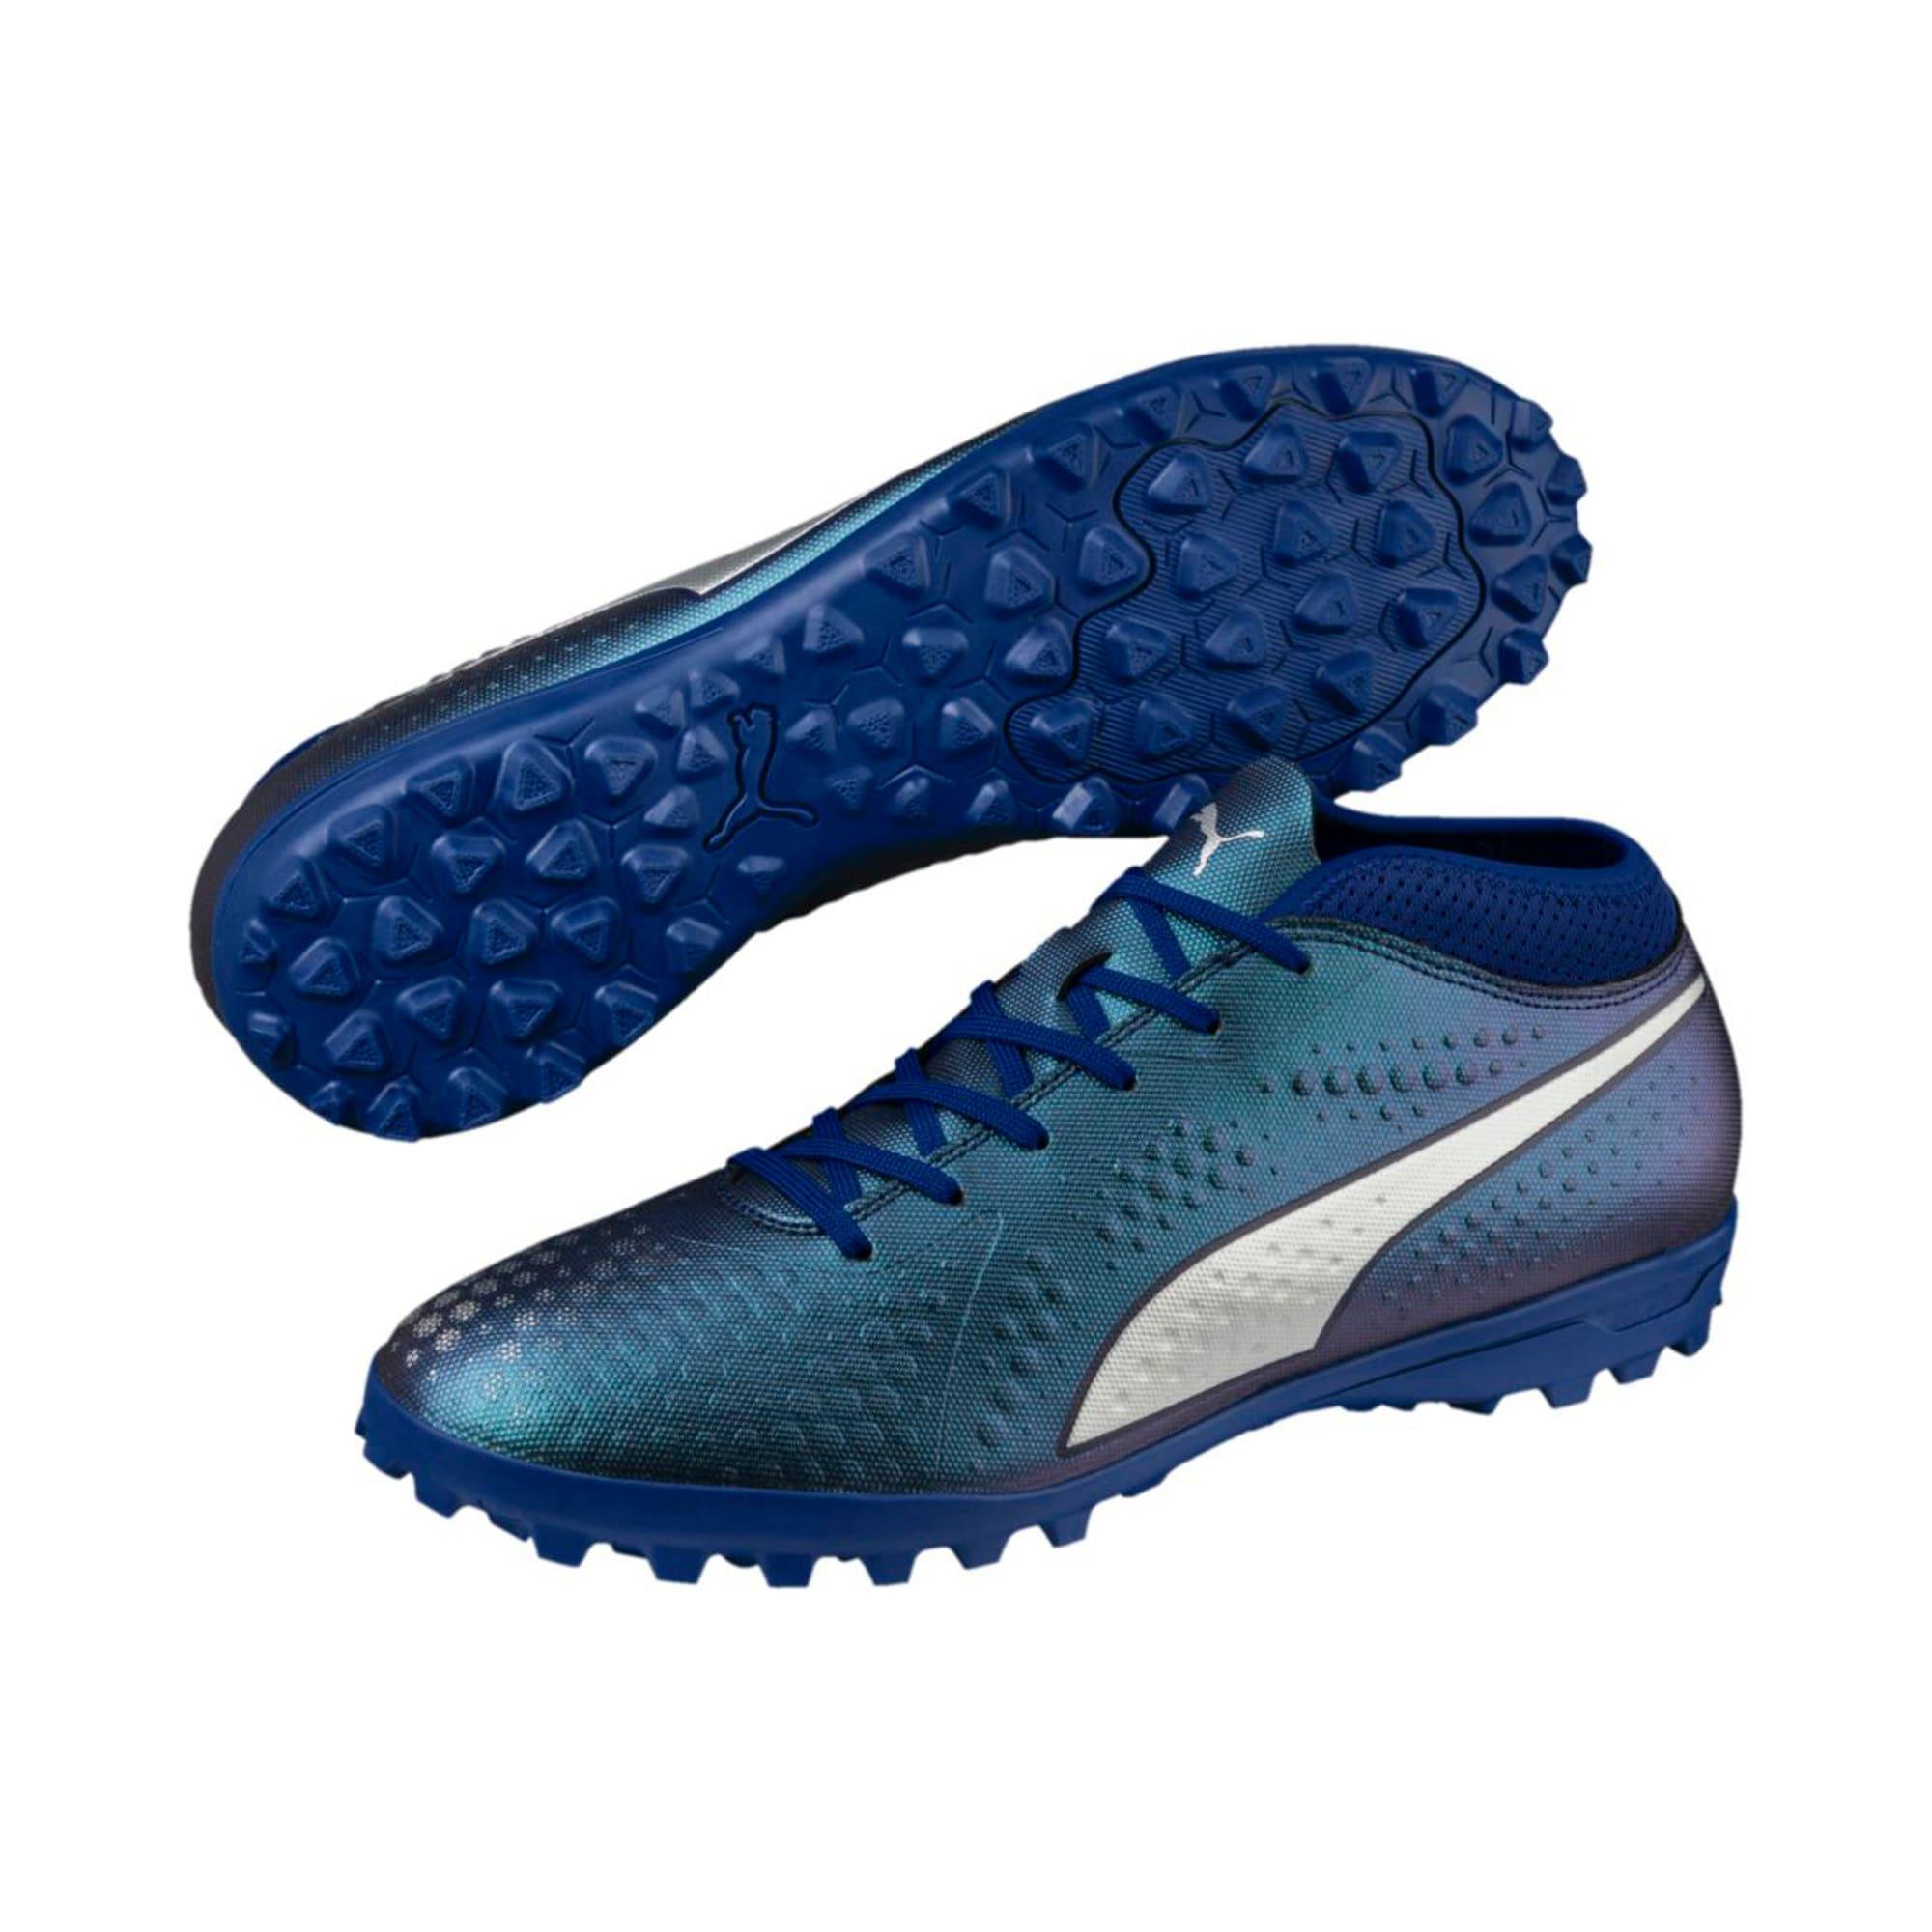 Thumbnail 2 of PUMA ONE 4 Synthetic TT Men's Football Boots, Sodalite Blue-Silver-Peacoat, medium-IND